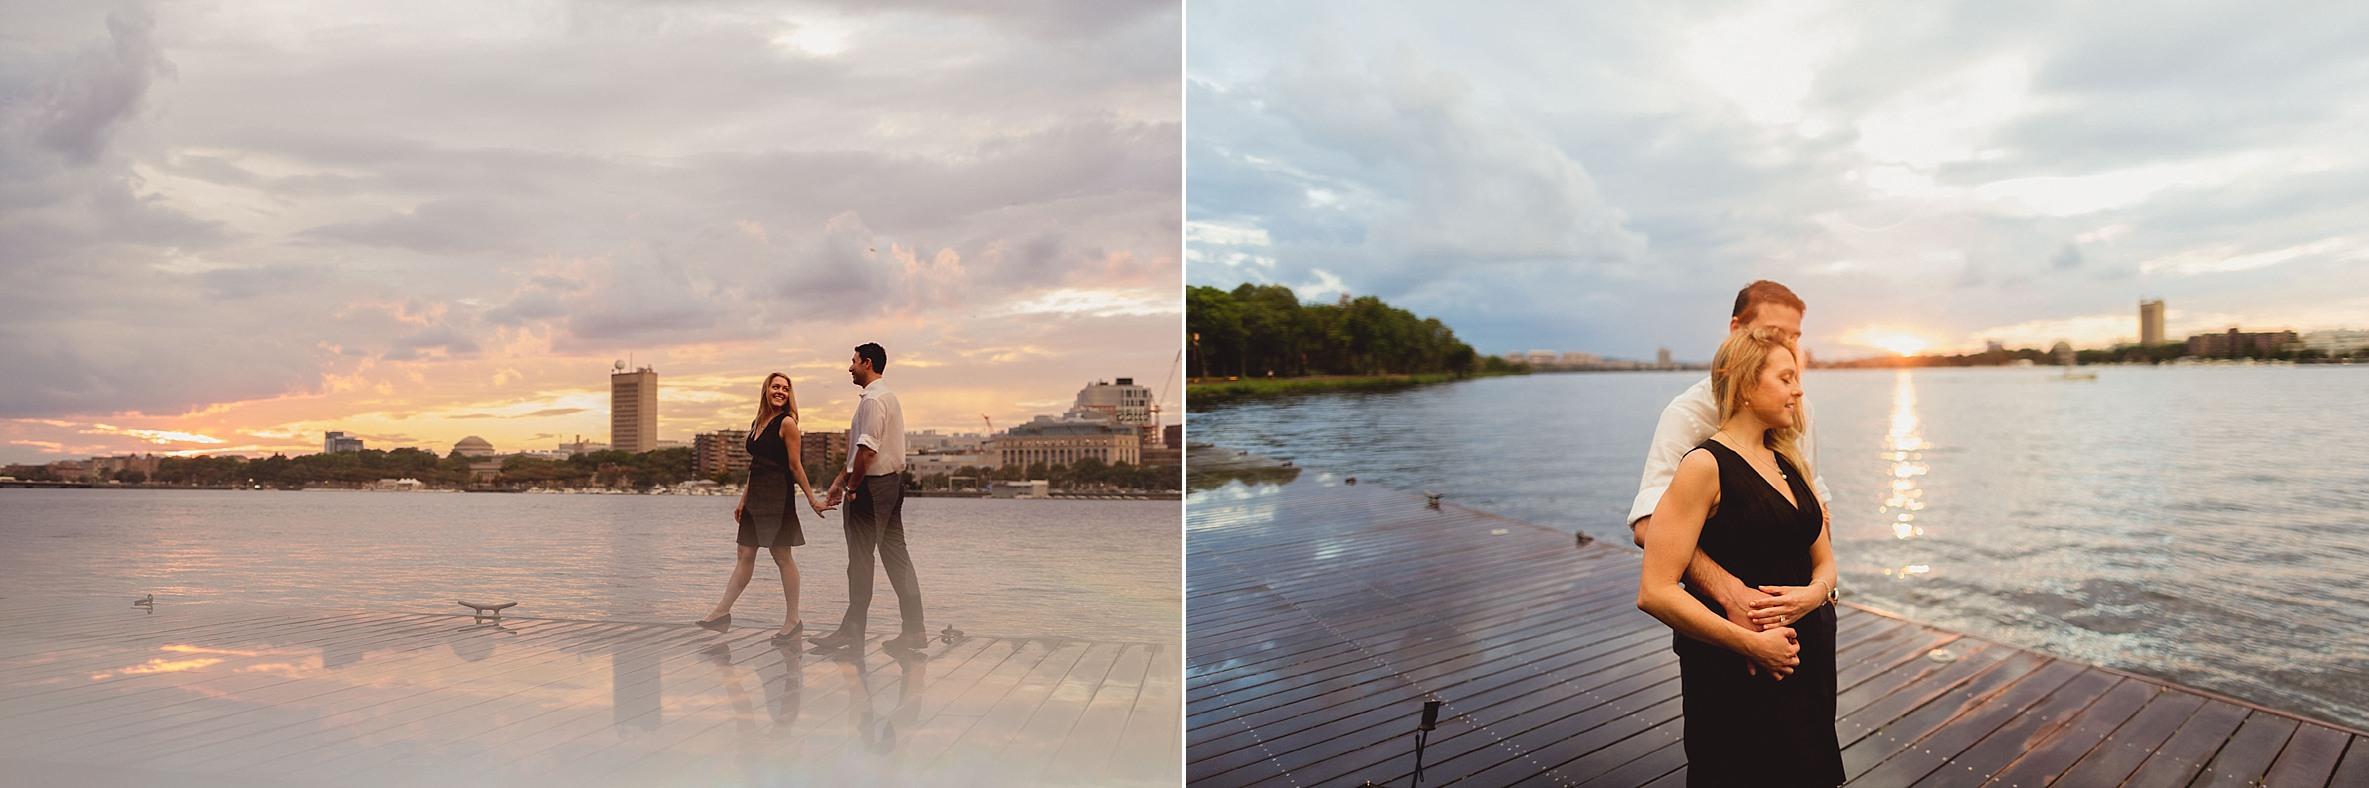 Boston-Engagment-photography-11.jpg